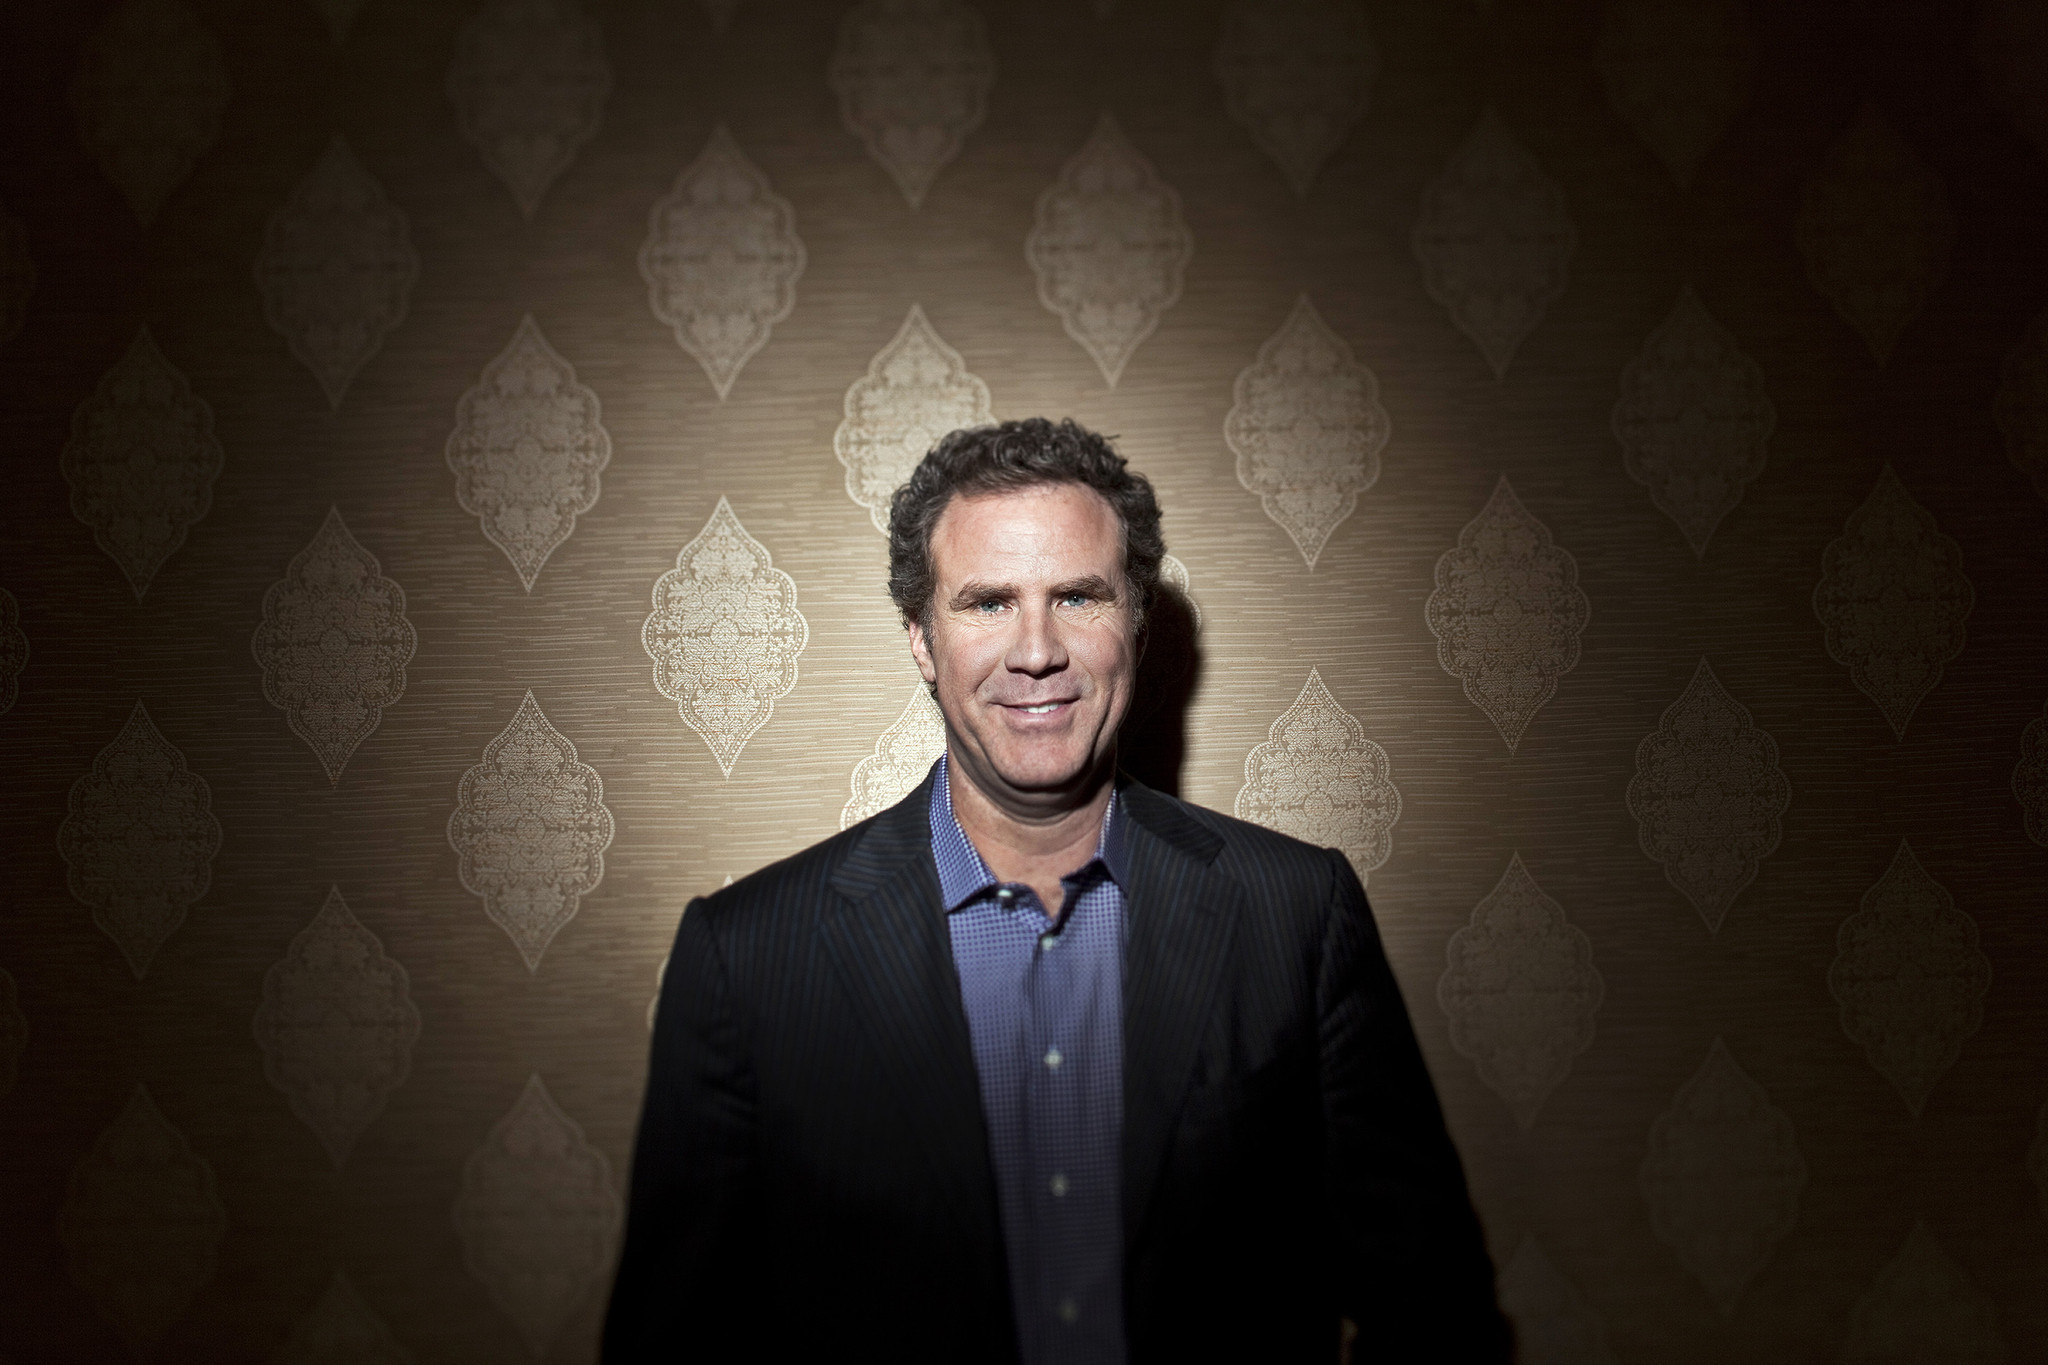 Will Ferrell Hd Desktop